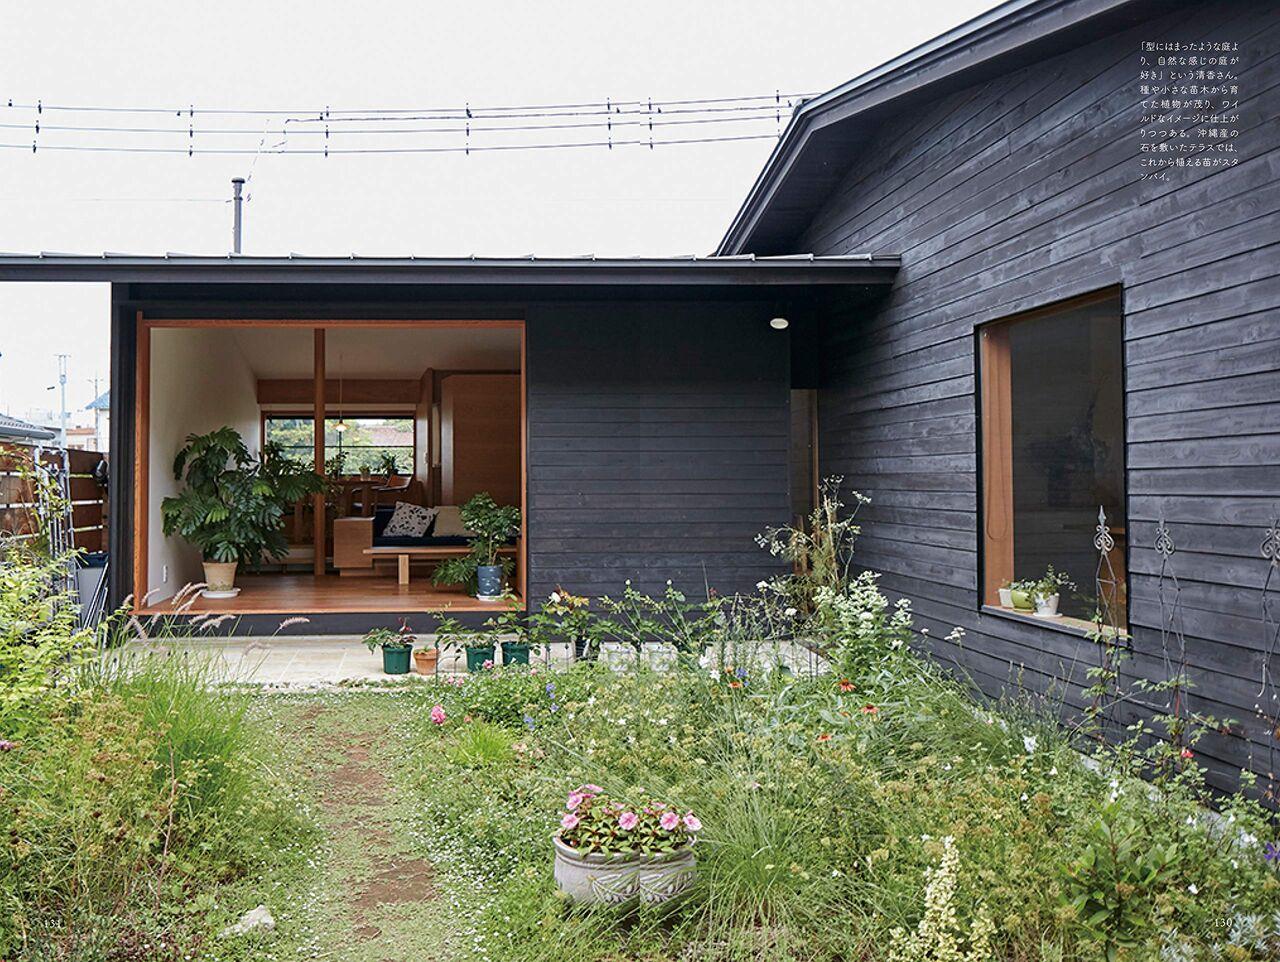 【画像】150万円で家(平屋)買った結果ァ!wwwwwwwwww